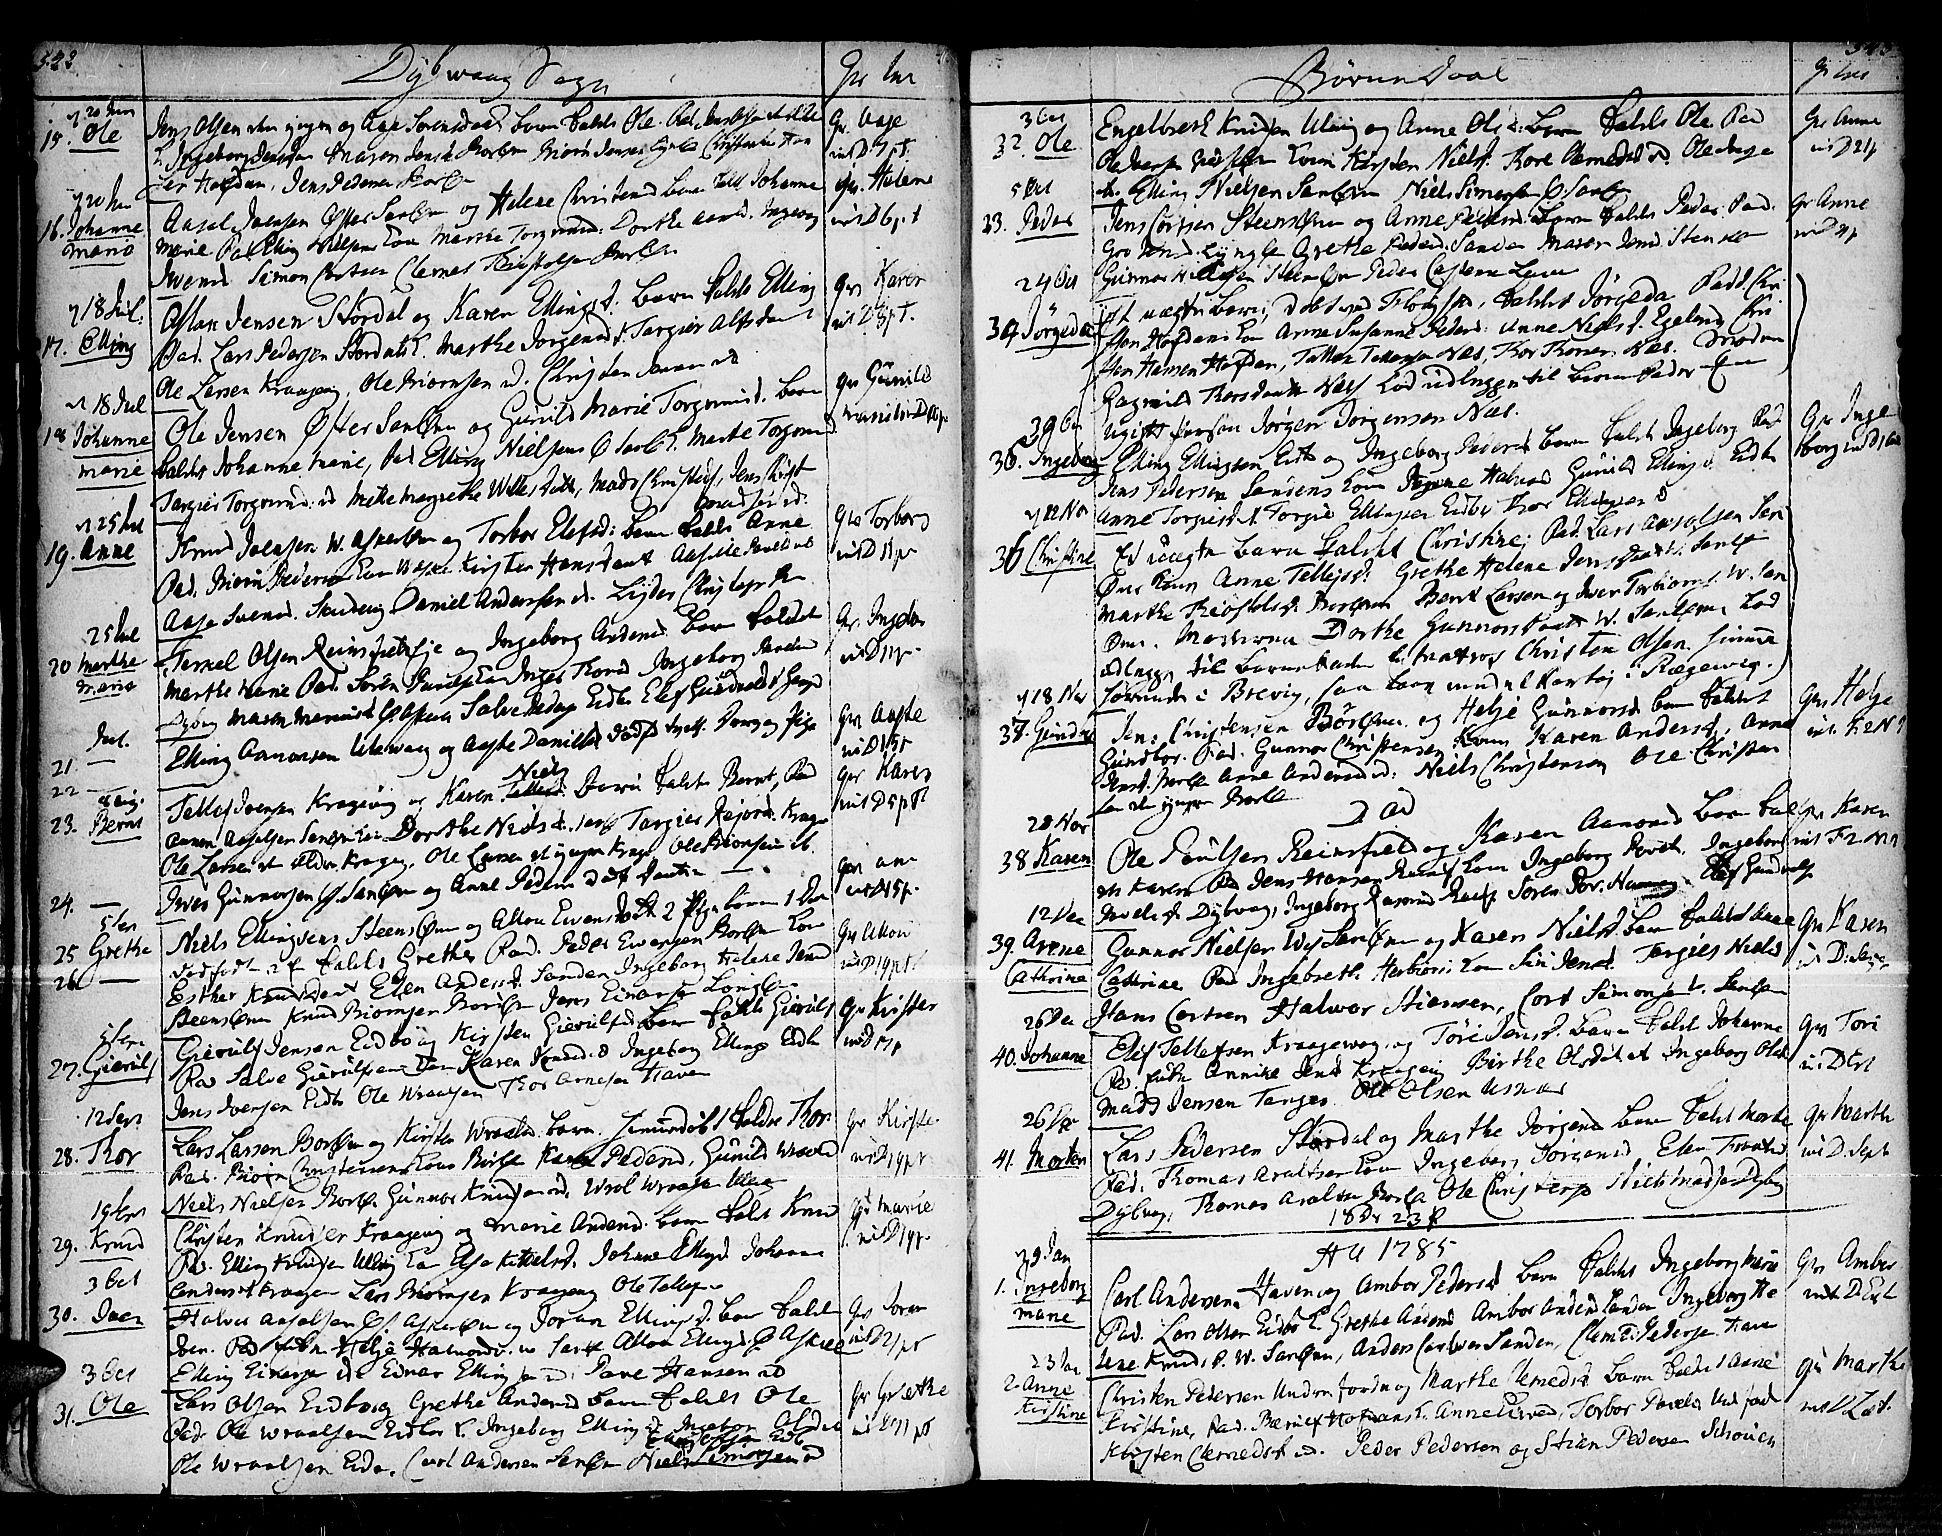 SAK, Dypvåg sokneprestkontor, F/Fa/Faa/L0001: Ministerialbok nr. A 1 /1, 1765-1798, s. 542-543